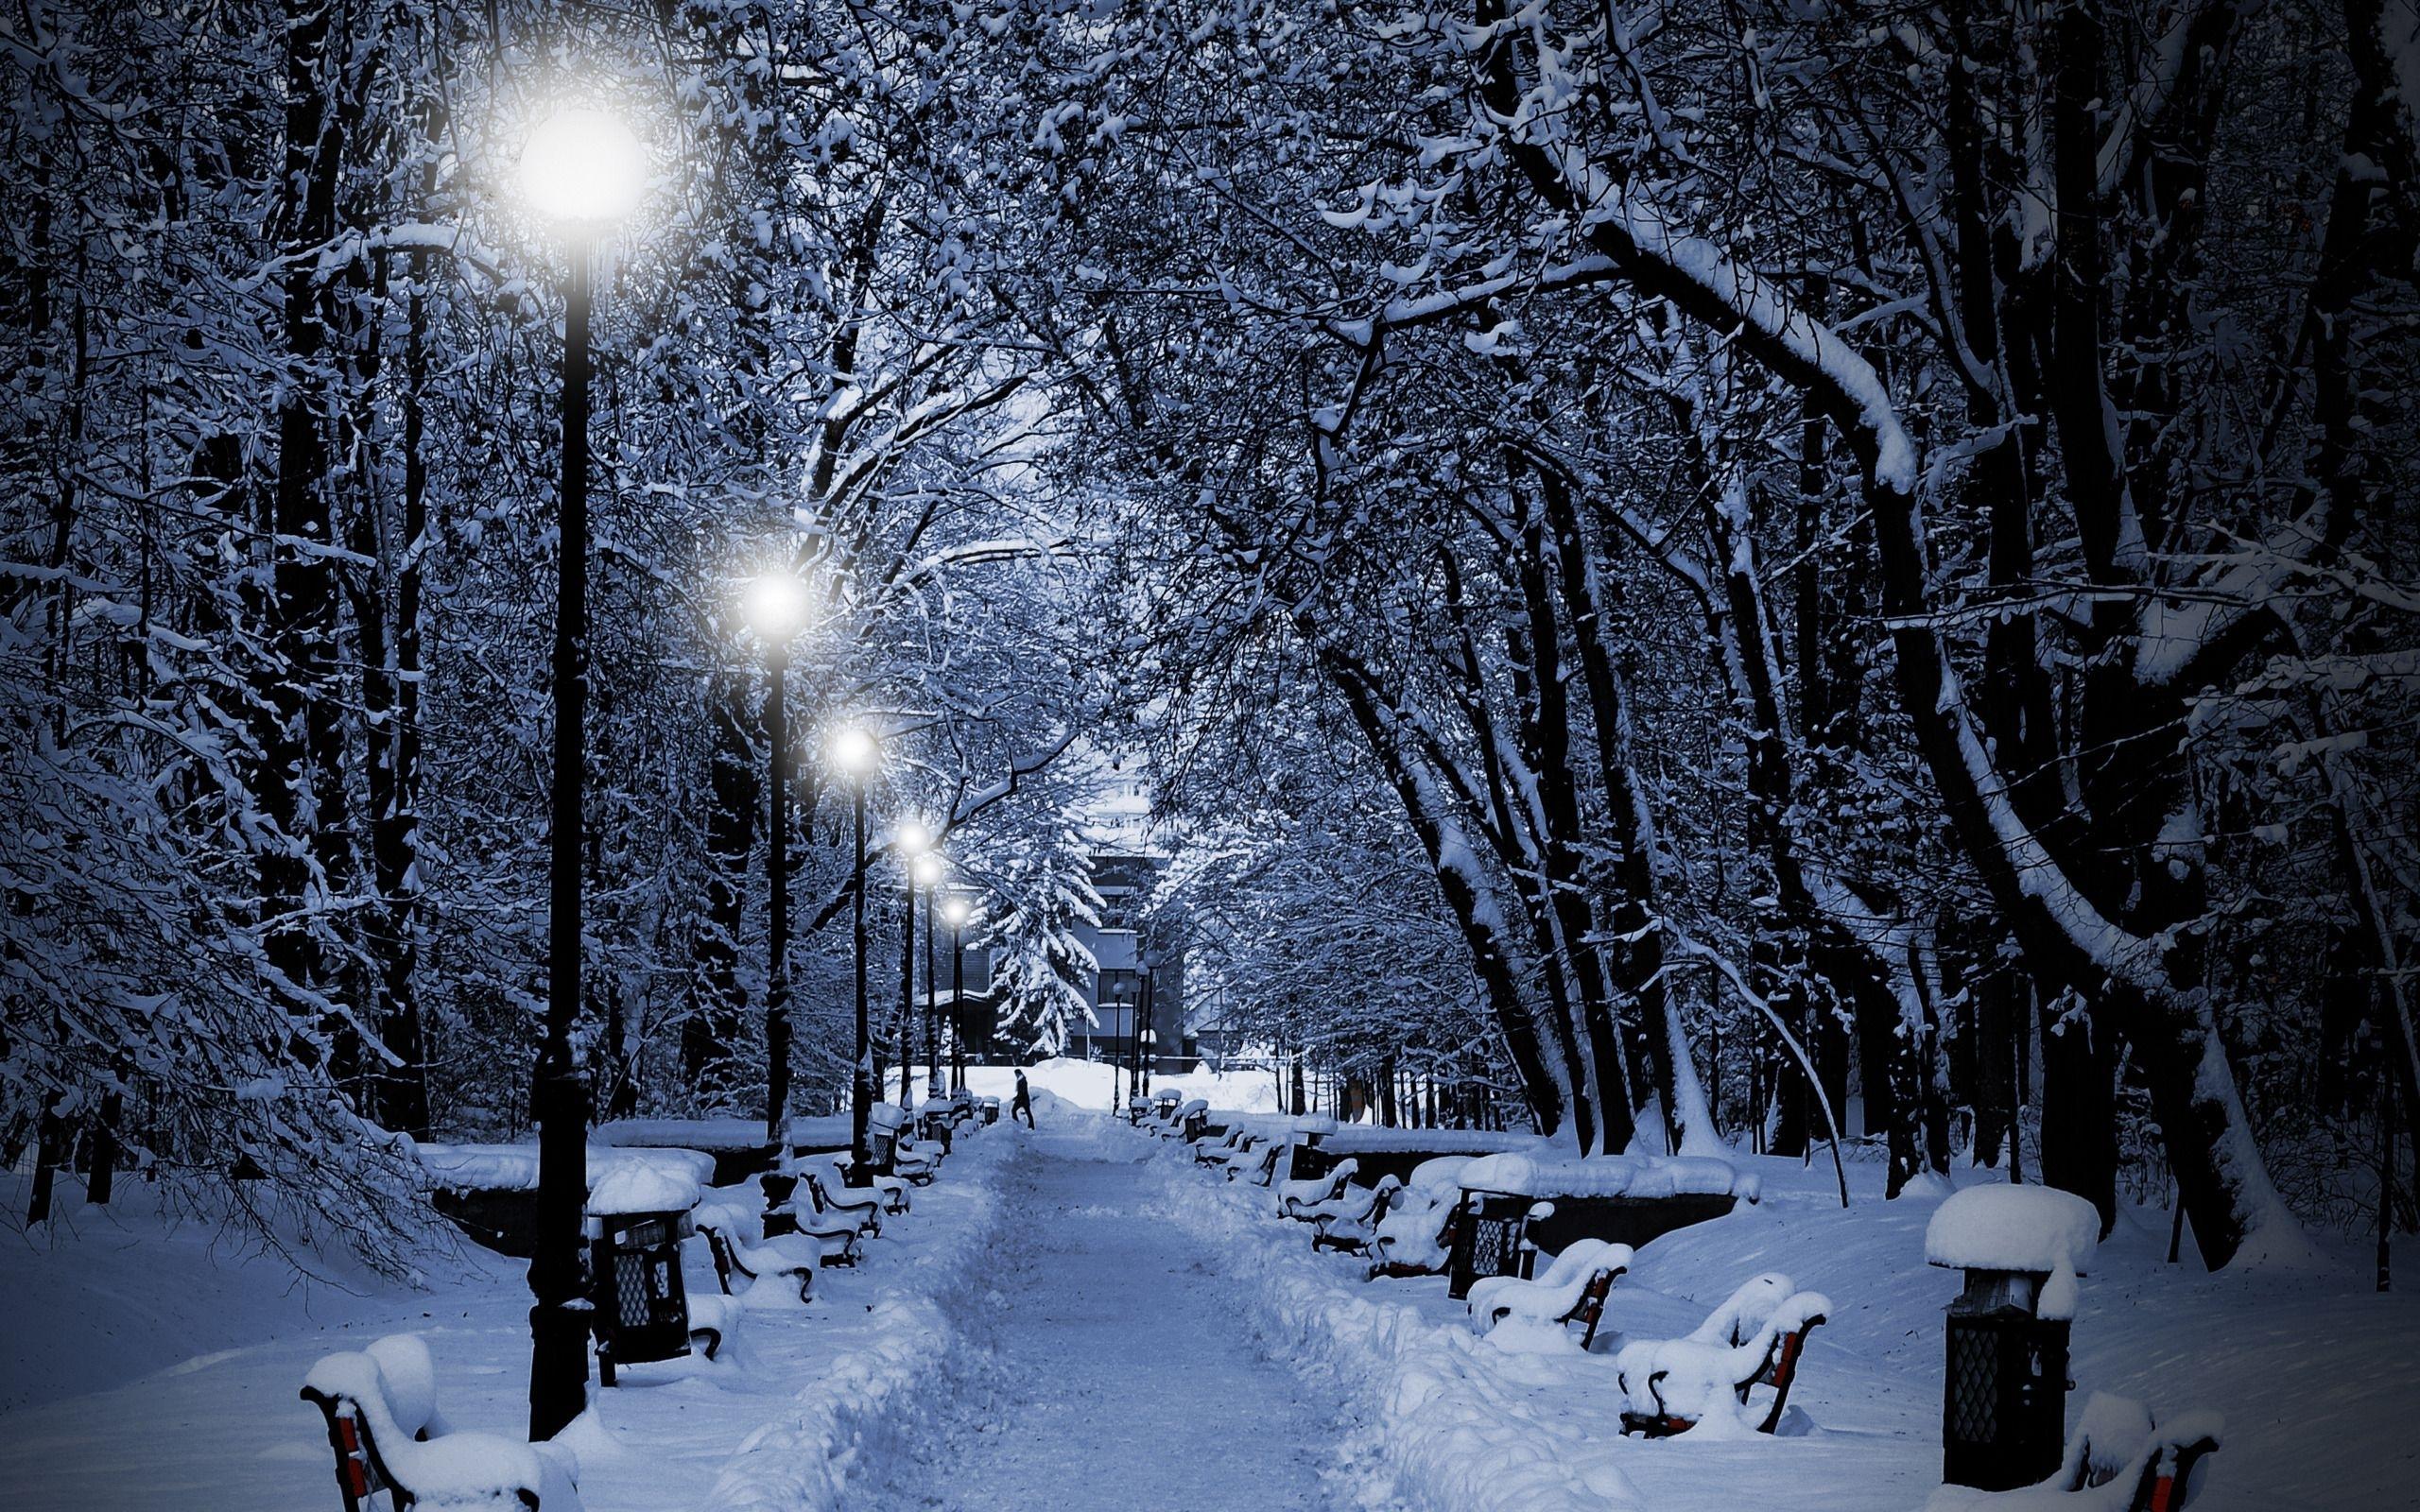 romantic winter night wallpapers widescreen » outdoors wallpaper 1080p